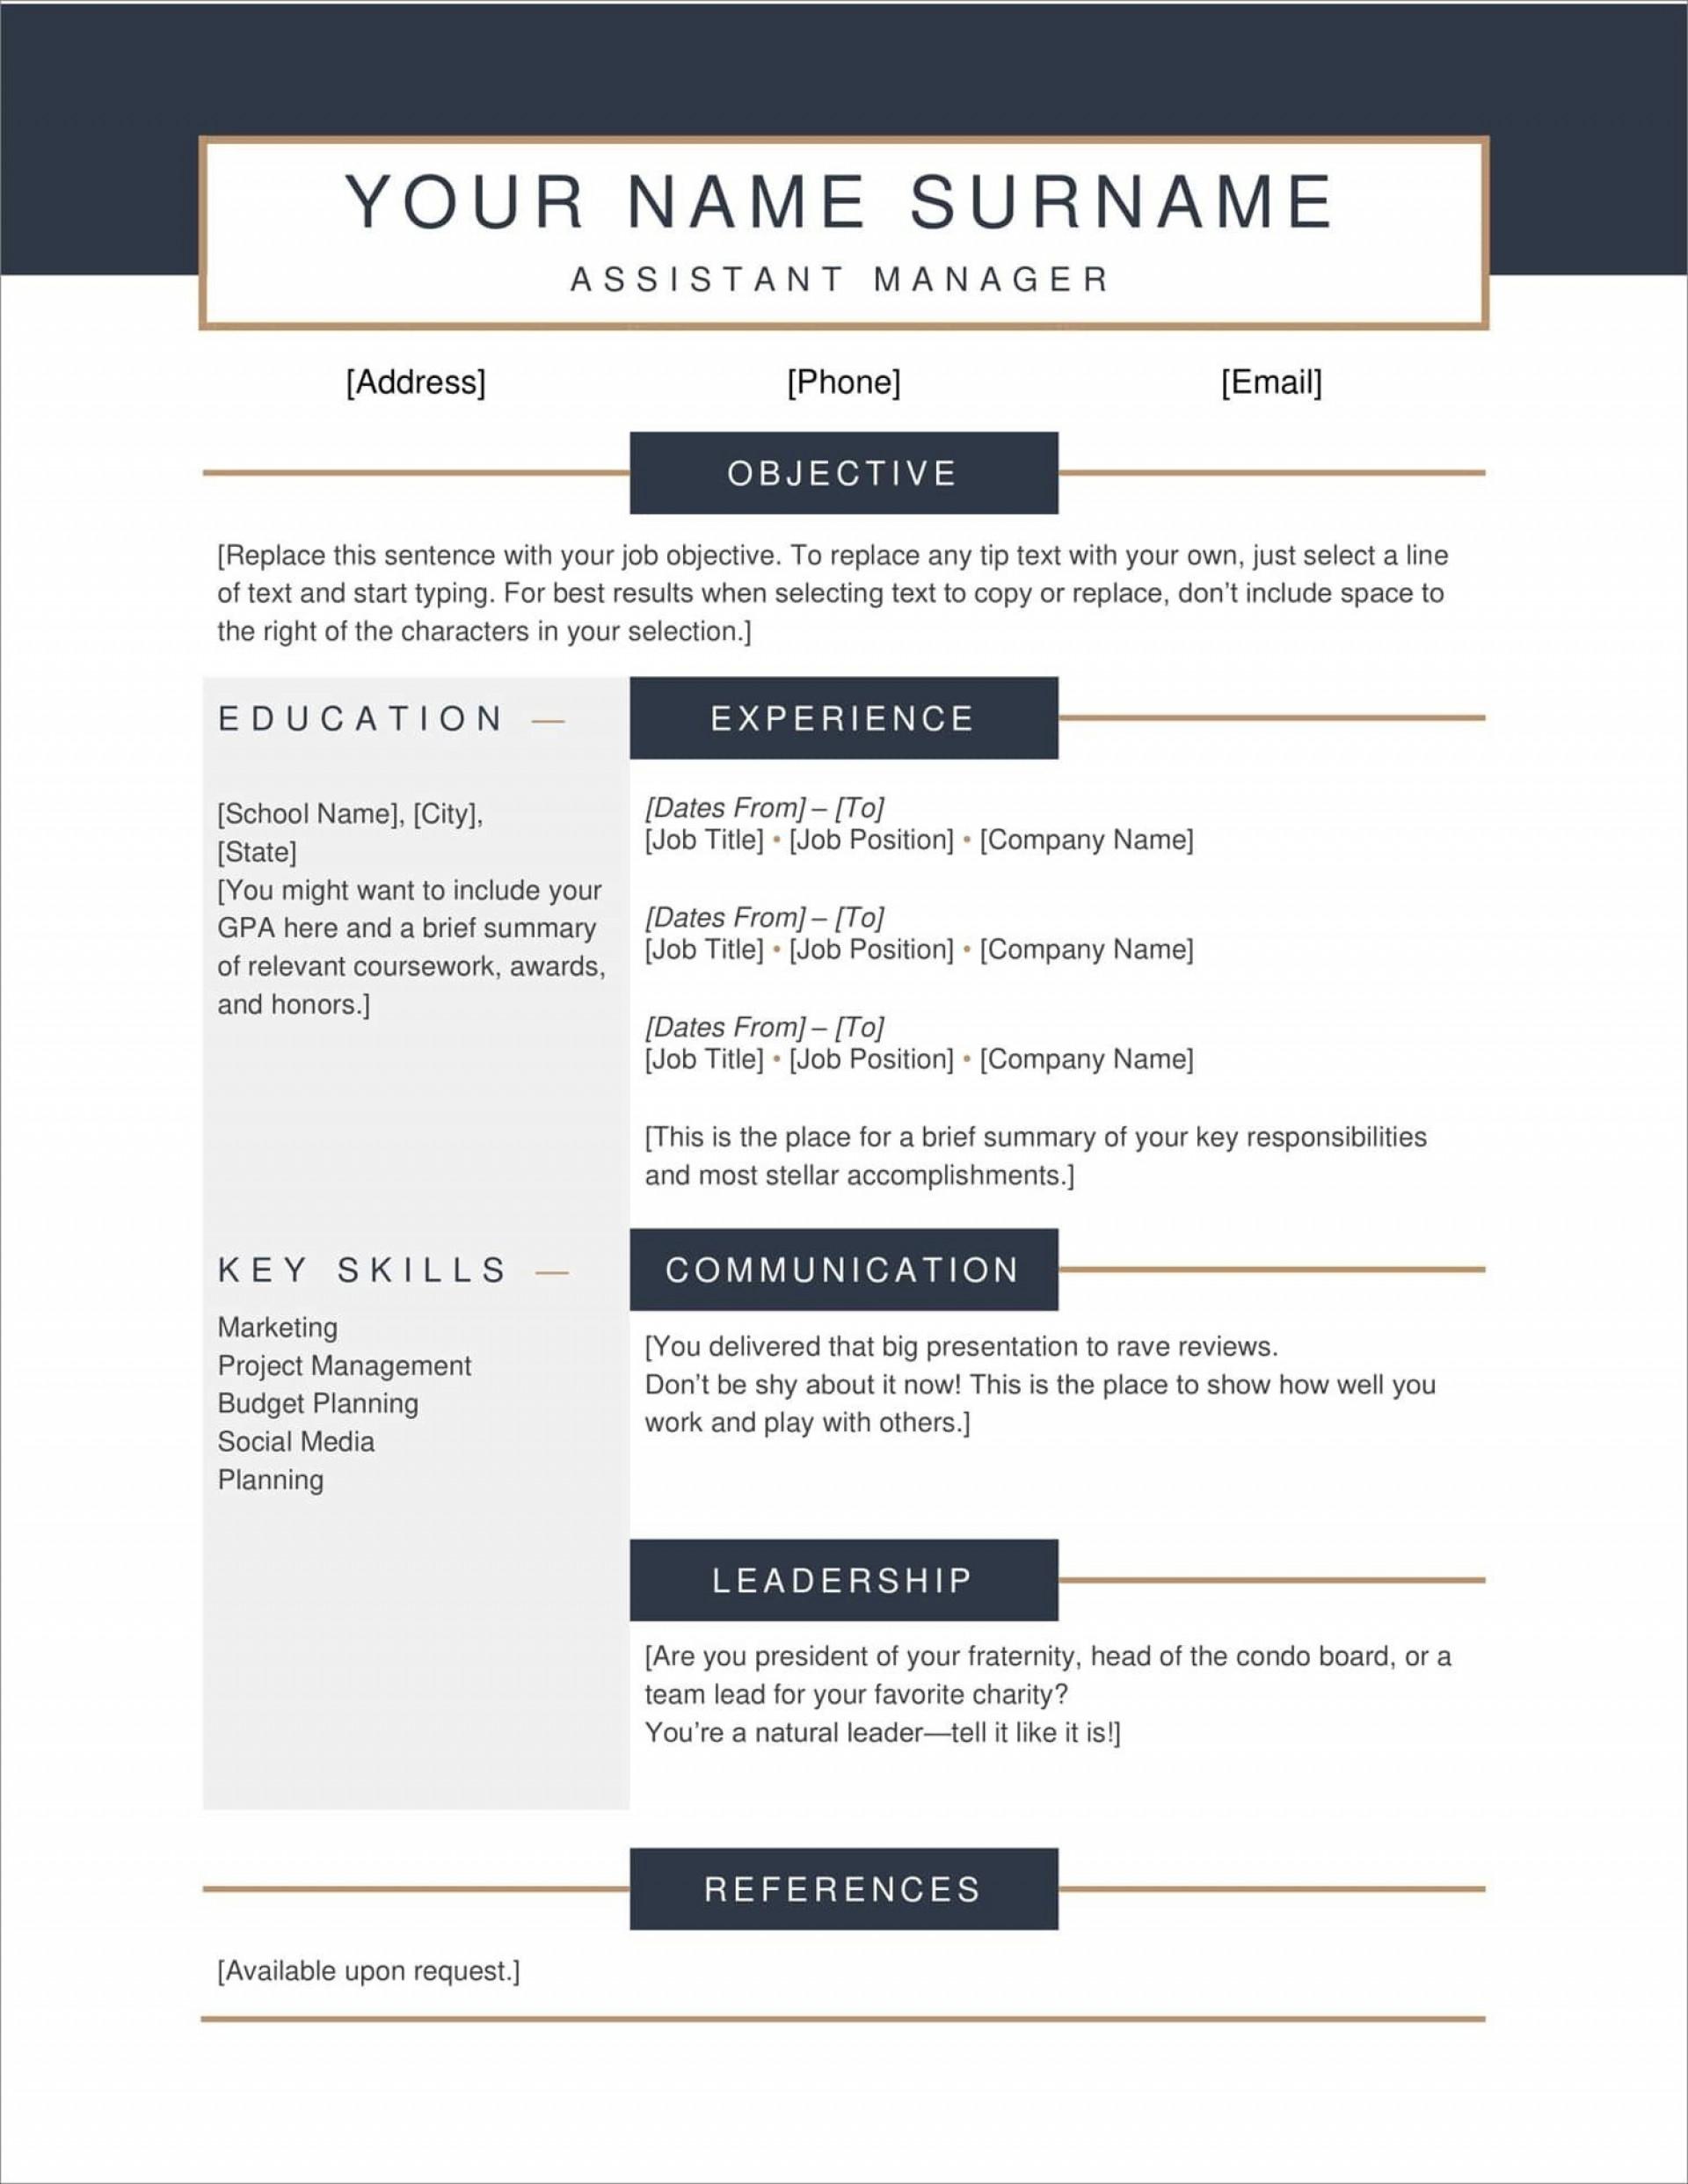 005 Frightening Free Printable Resume Template Word Design  Microsoft1920